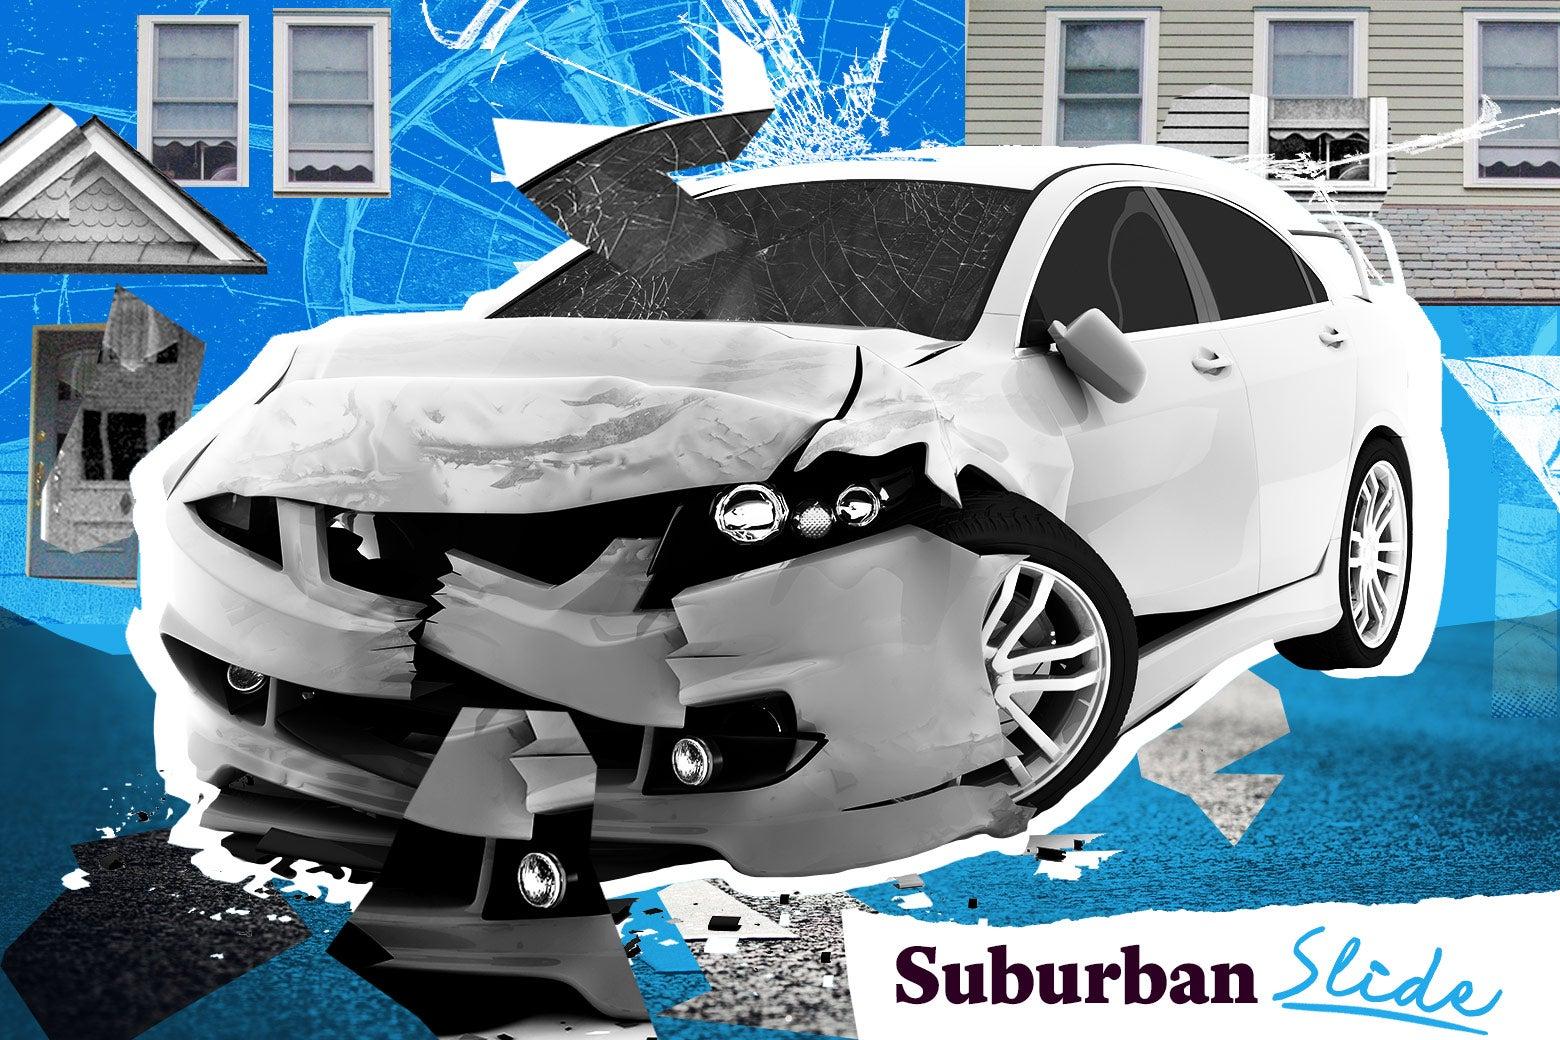 Broken down car in the suburbs.